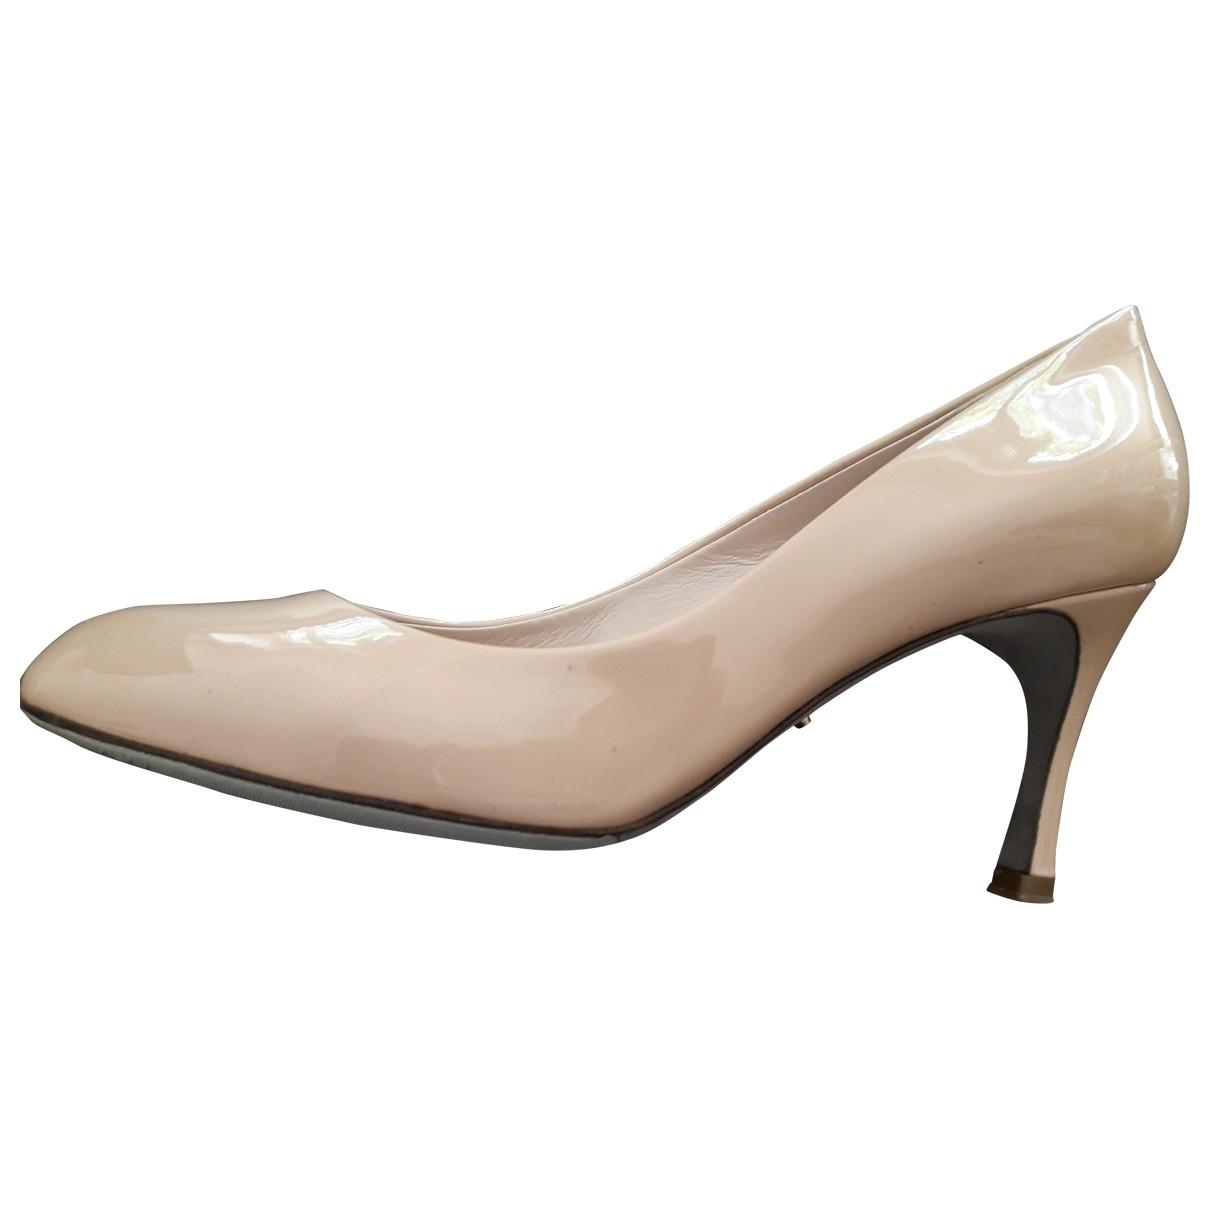 Sergio Rossi \N Beige Patent leather Heels for Women 36 EU